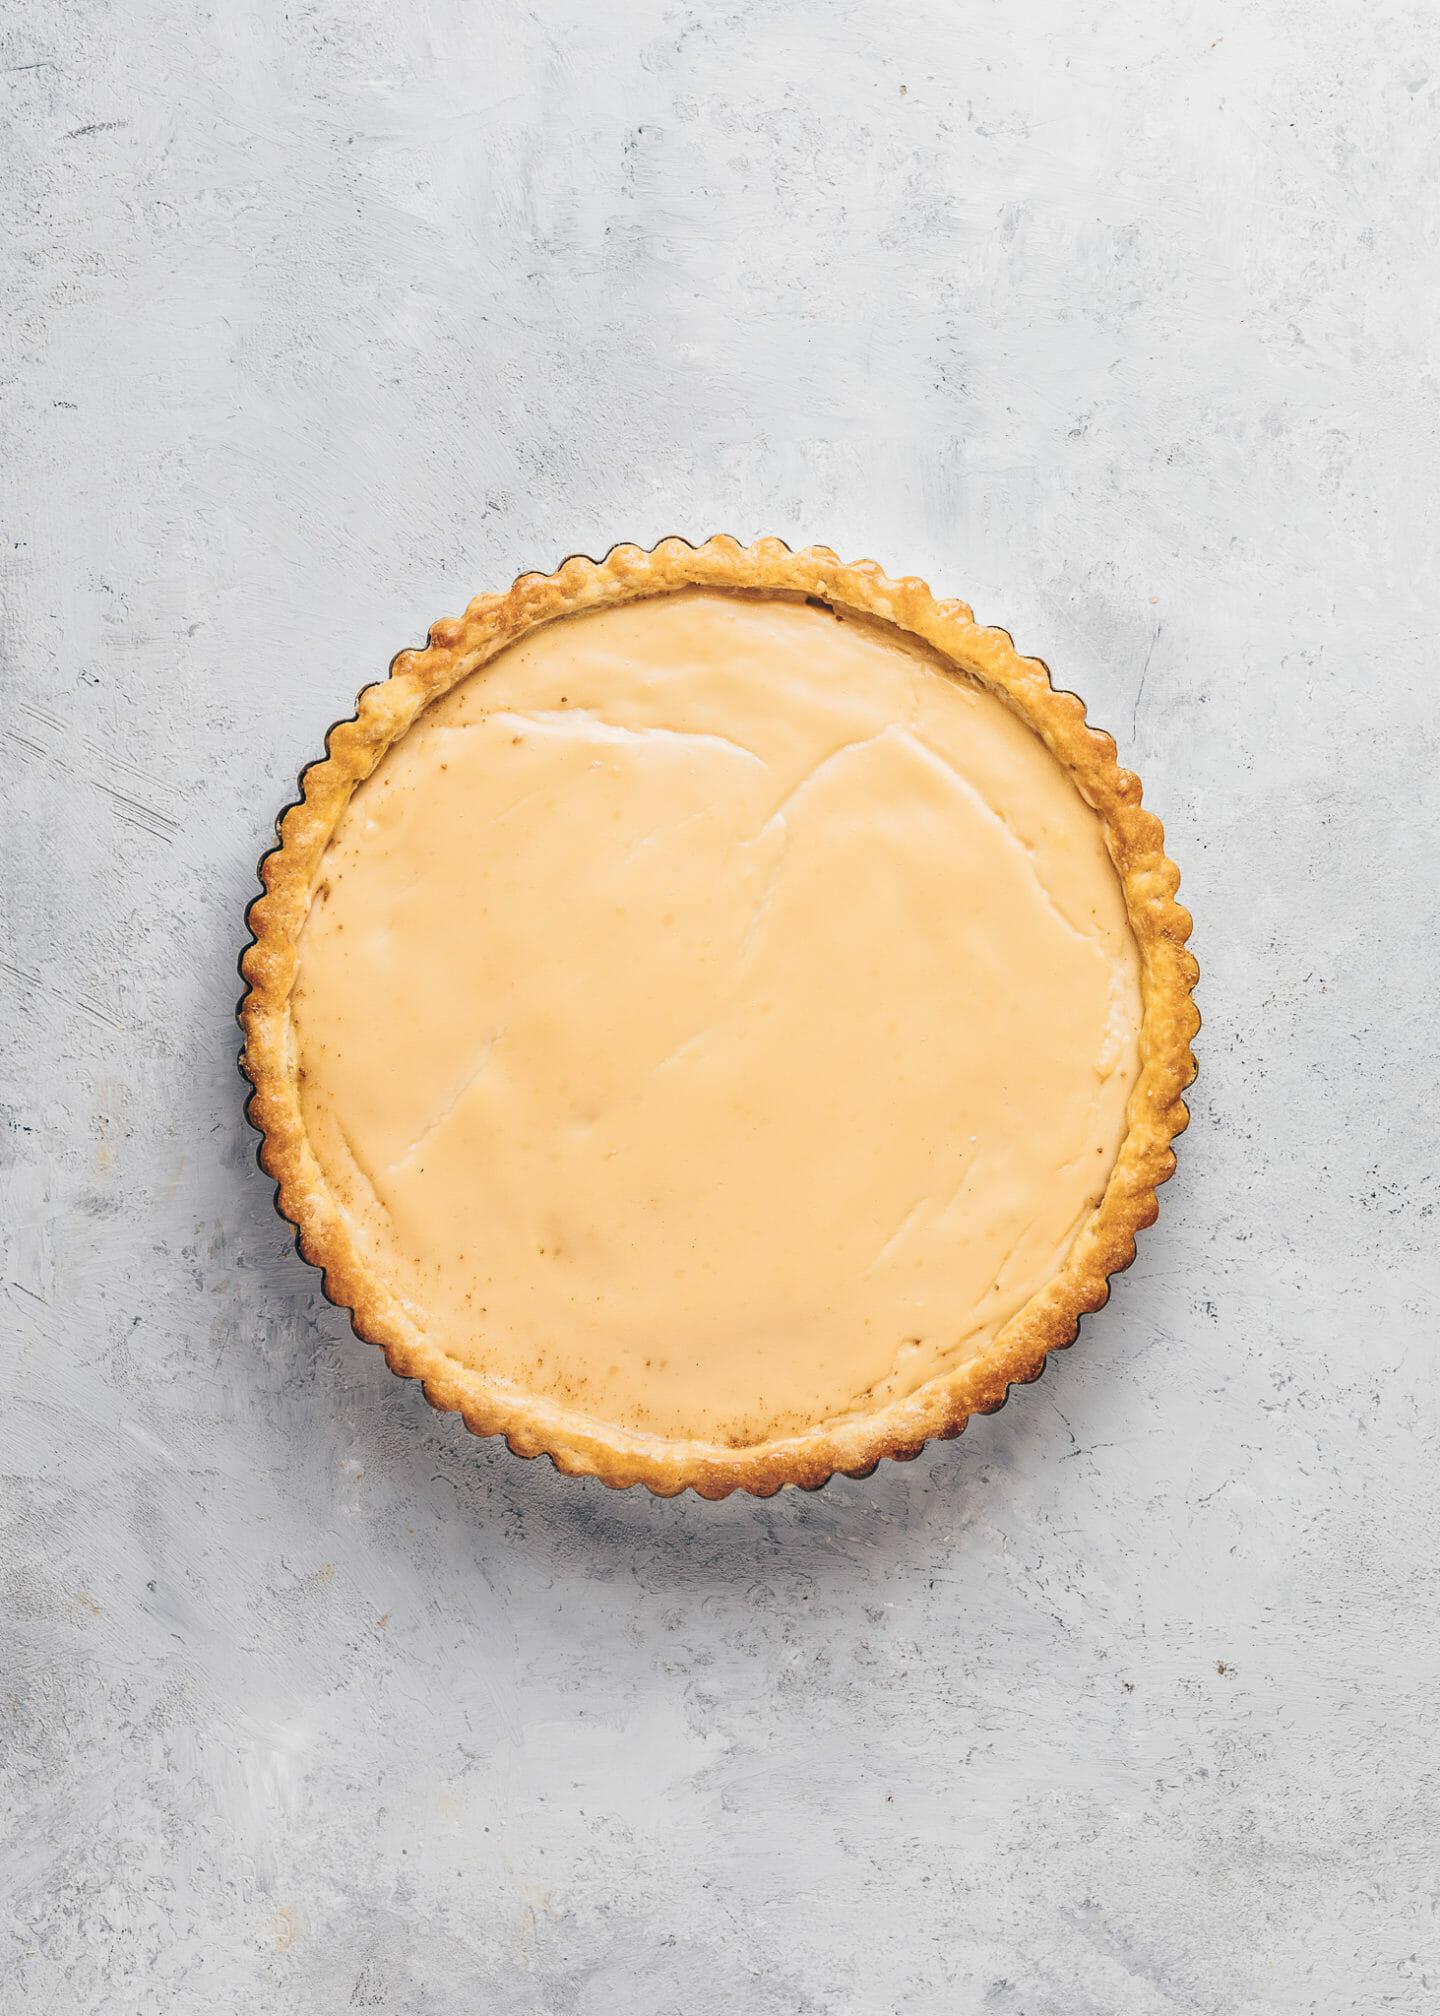 Tart with vanilla pudding milk custard filling